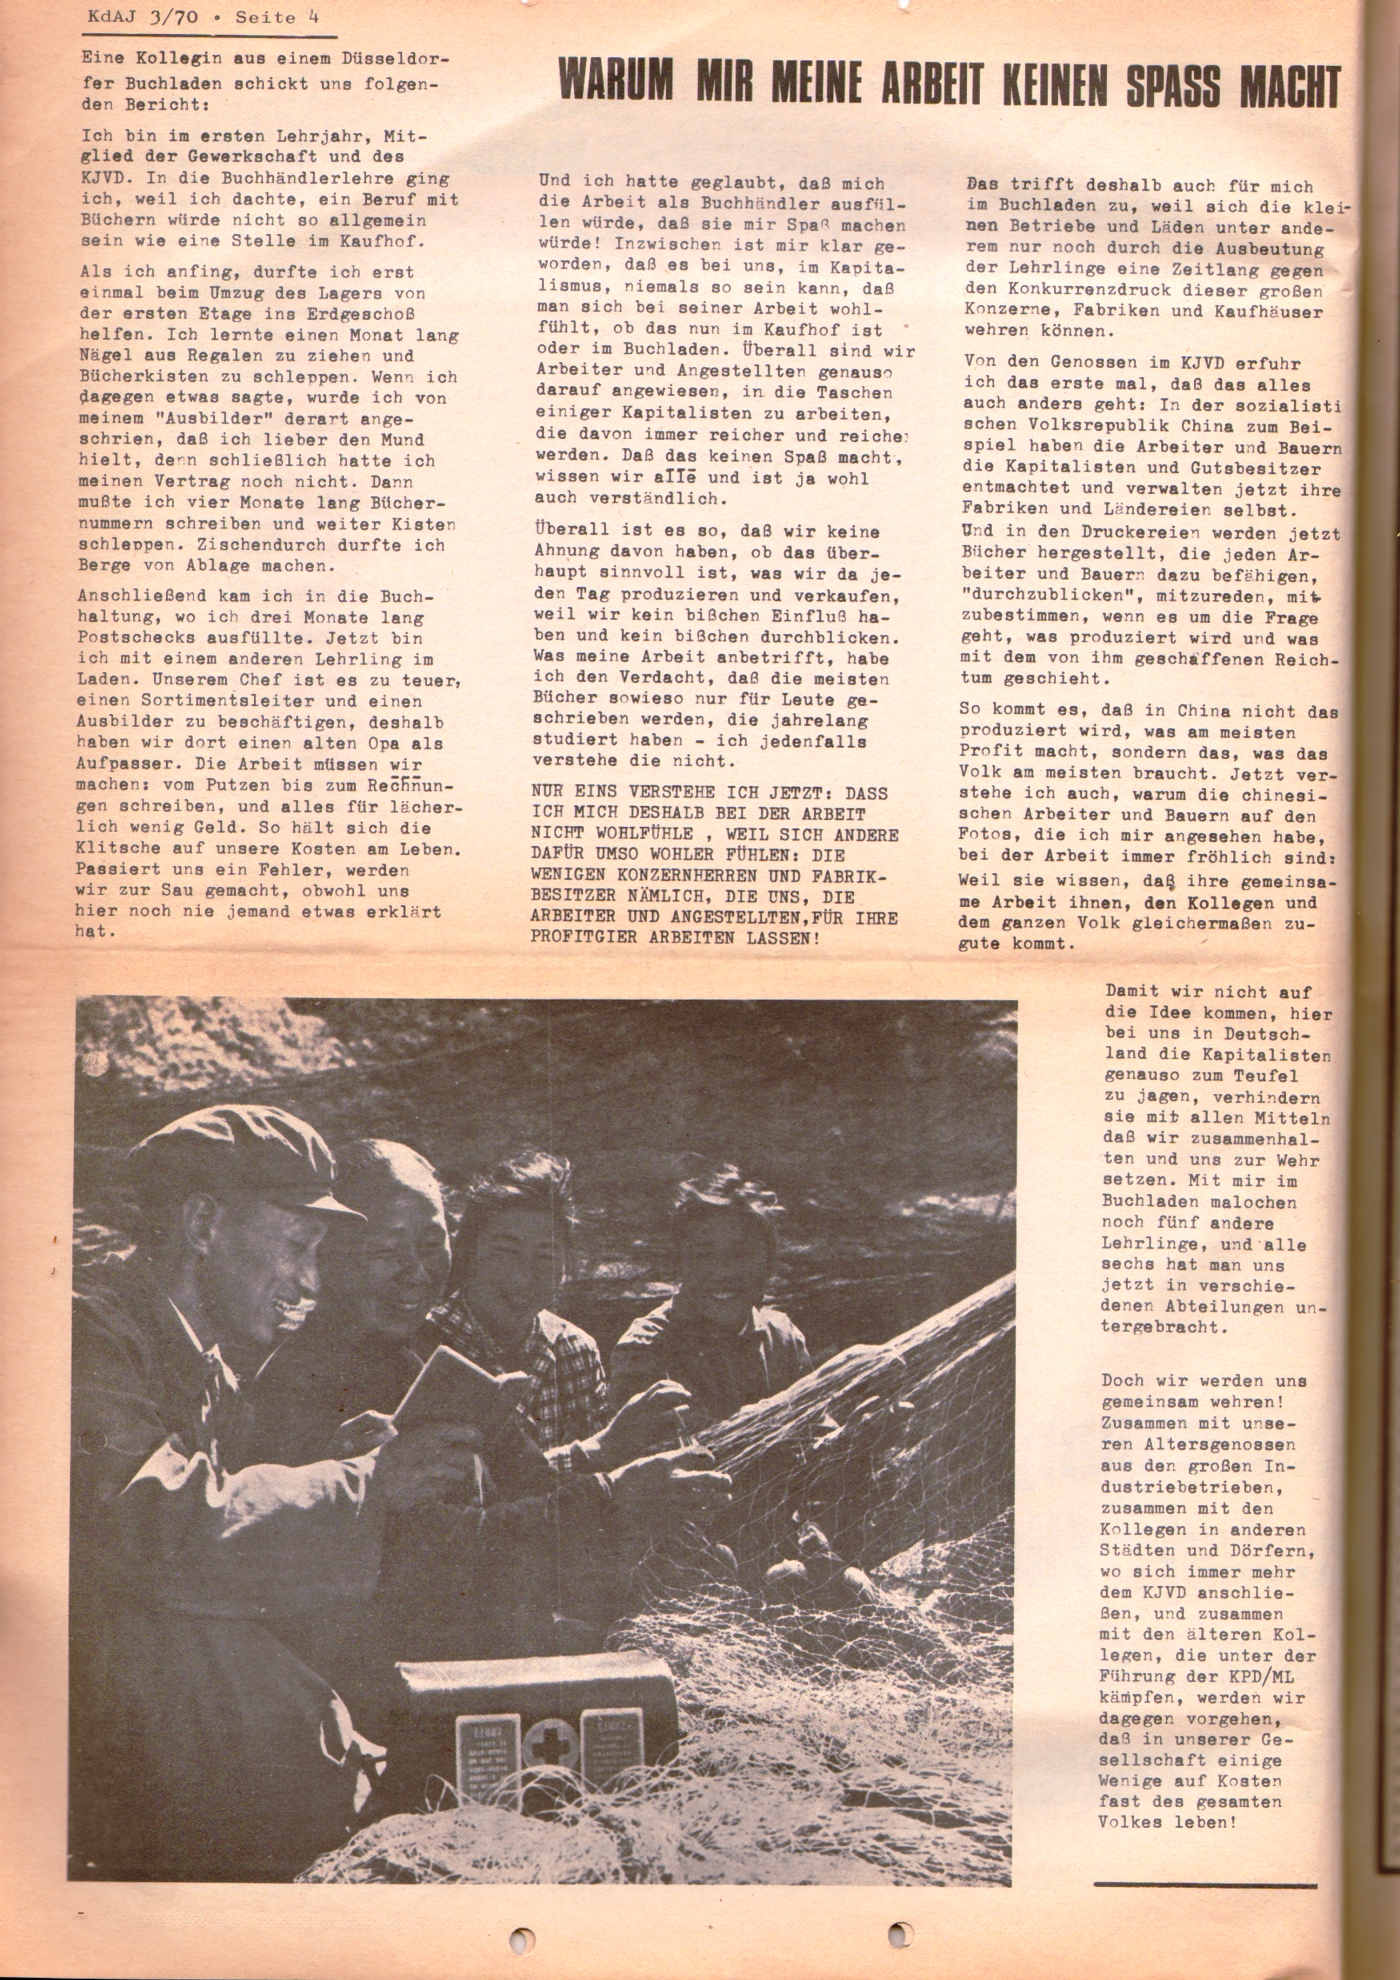 KDAJ, 1. Jg., August 1970, Nr. 3, Seite 4